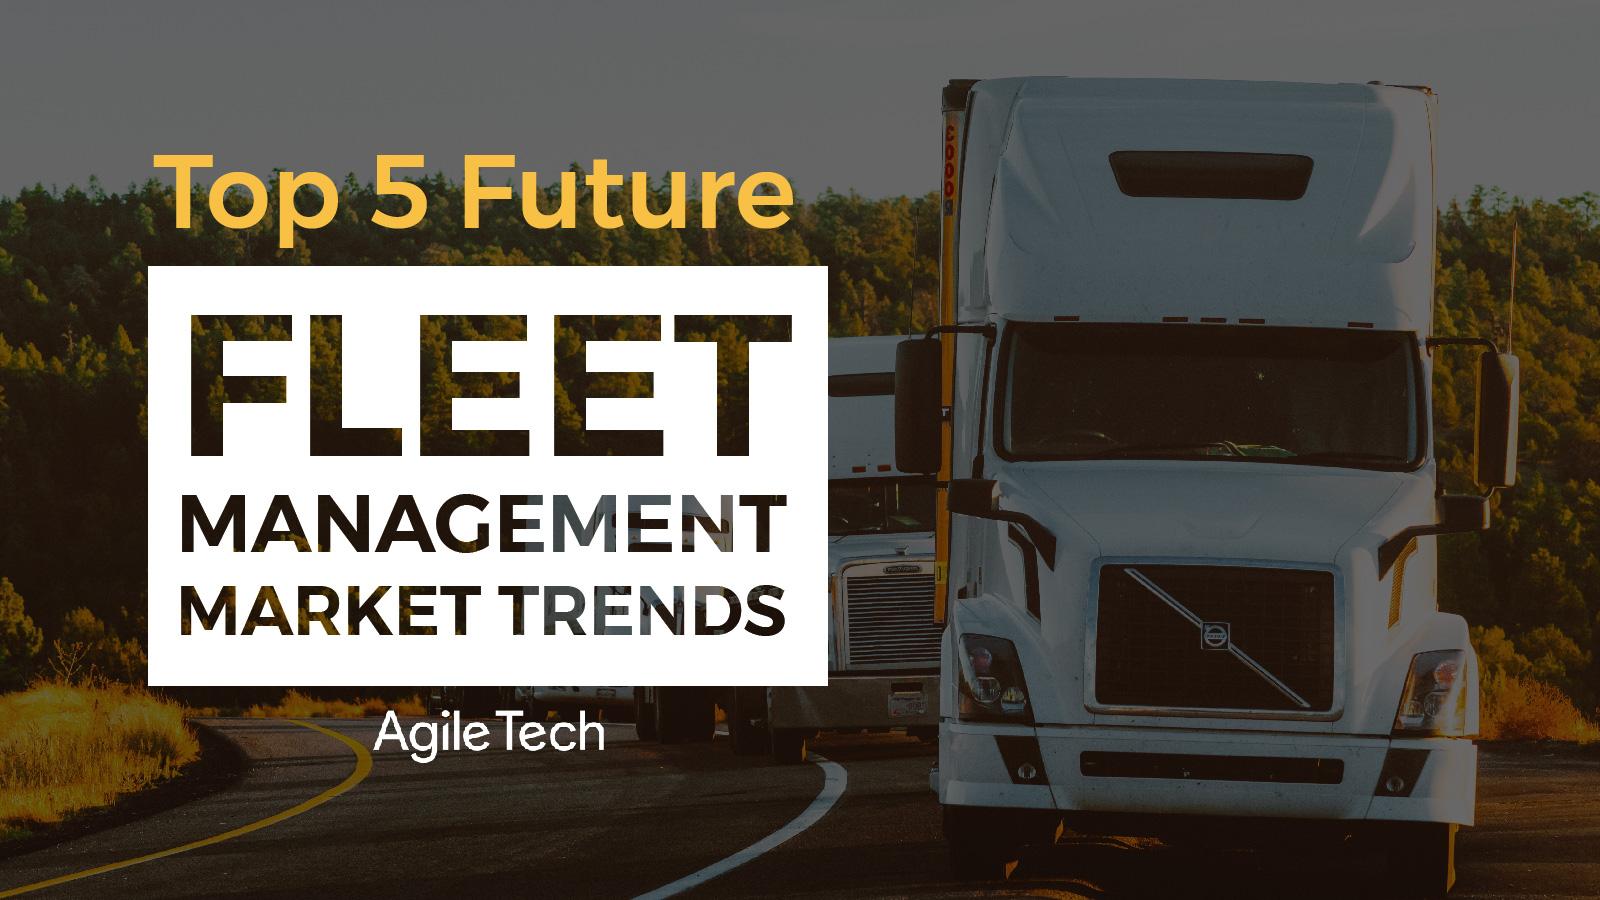 top fleet management industry trends 2020 fleet tracking GPS tracking fleet maintenance software by agiletech offshore software company